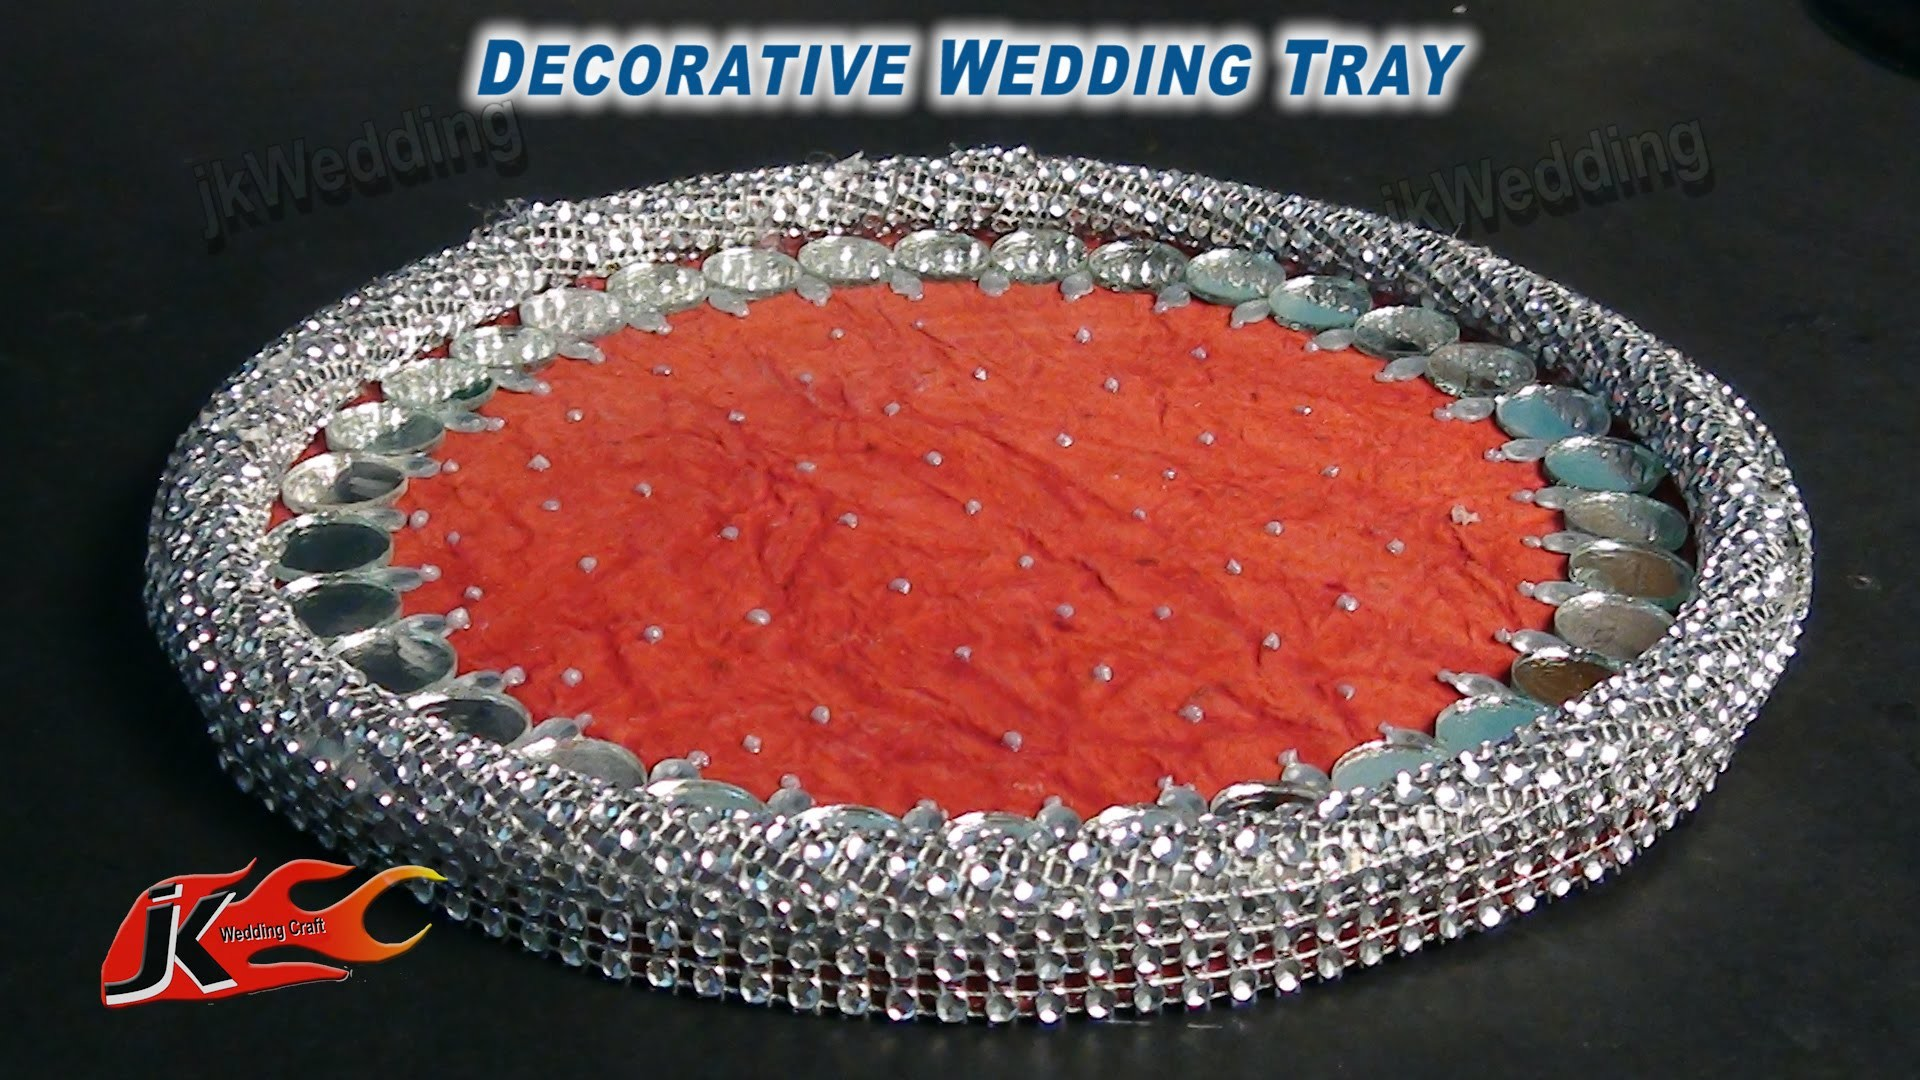 DIY HOW to Make  Decorative Wedding Tray - JK Wedding Craft 011